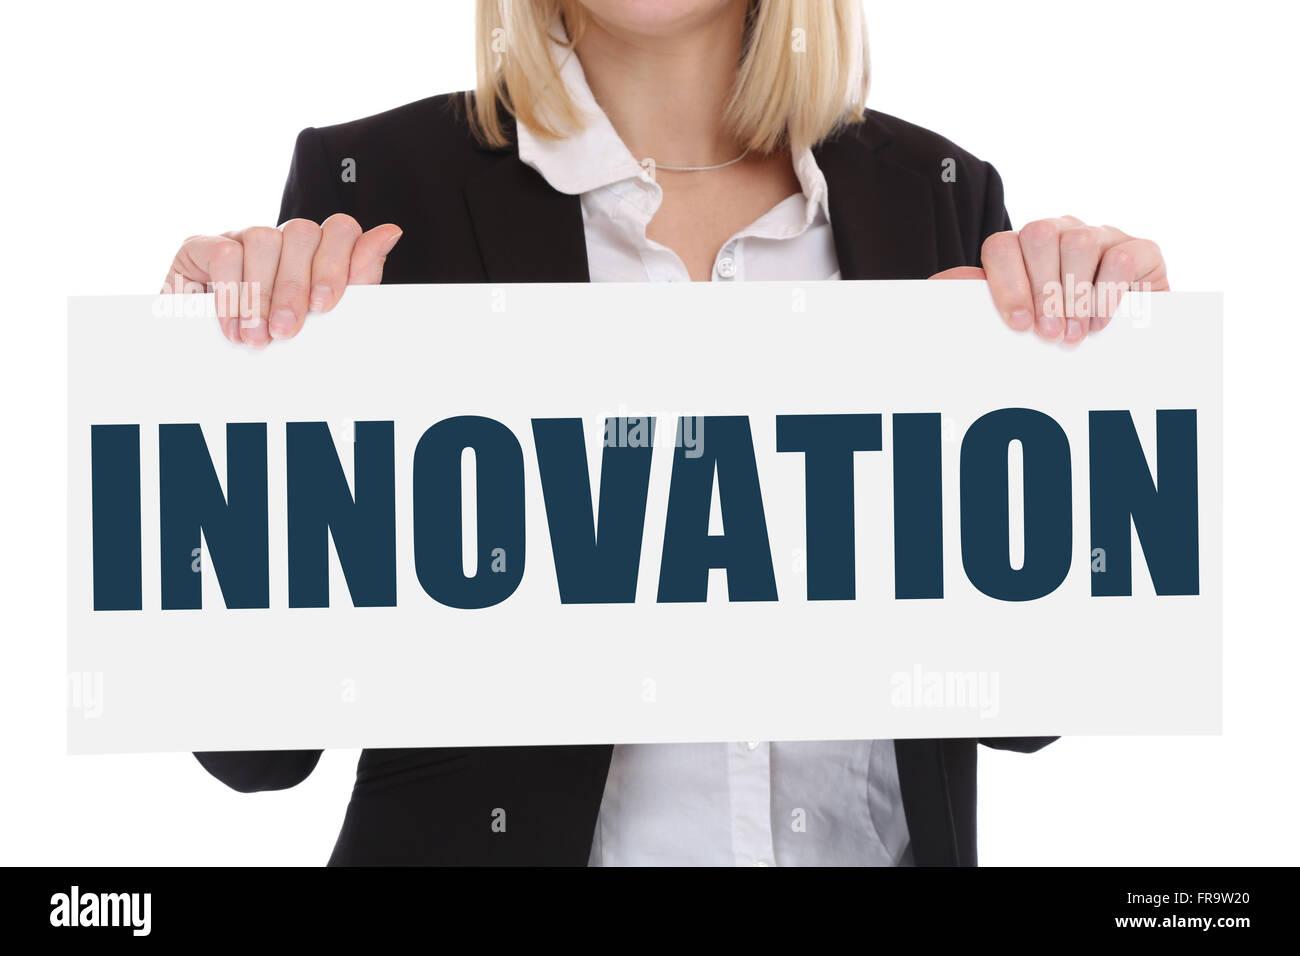 Innovation idea leadership success successful winning business concept innovate creativity creative - Stock Image